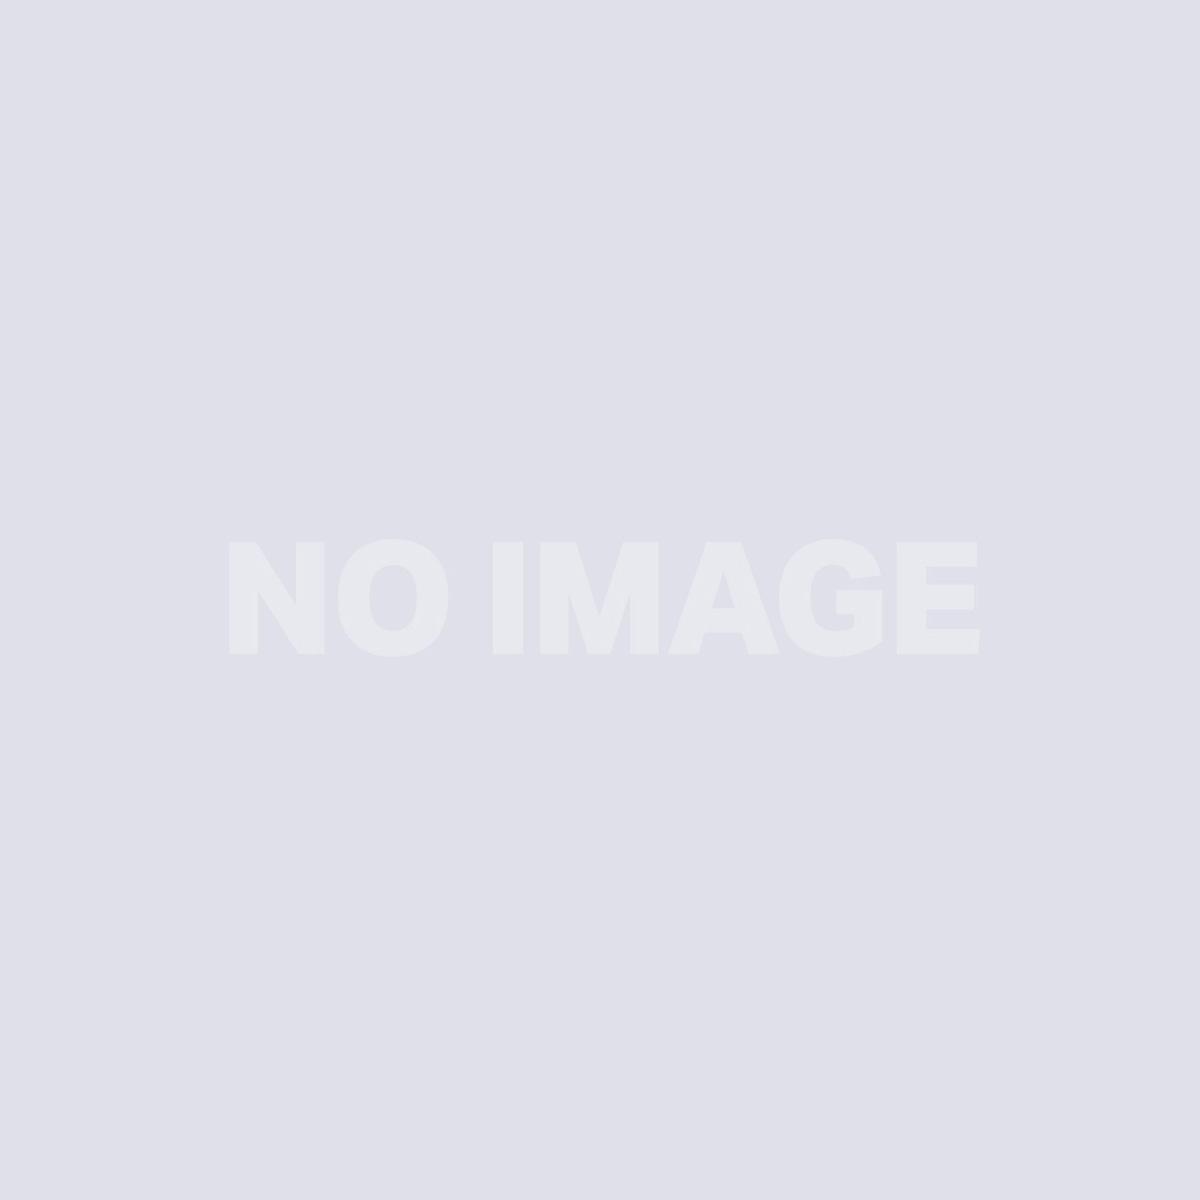 Nylon Fixed Castor Wheel - Technical Diagram